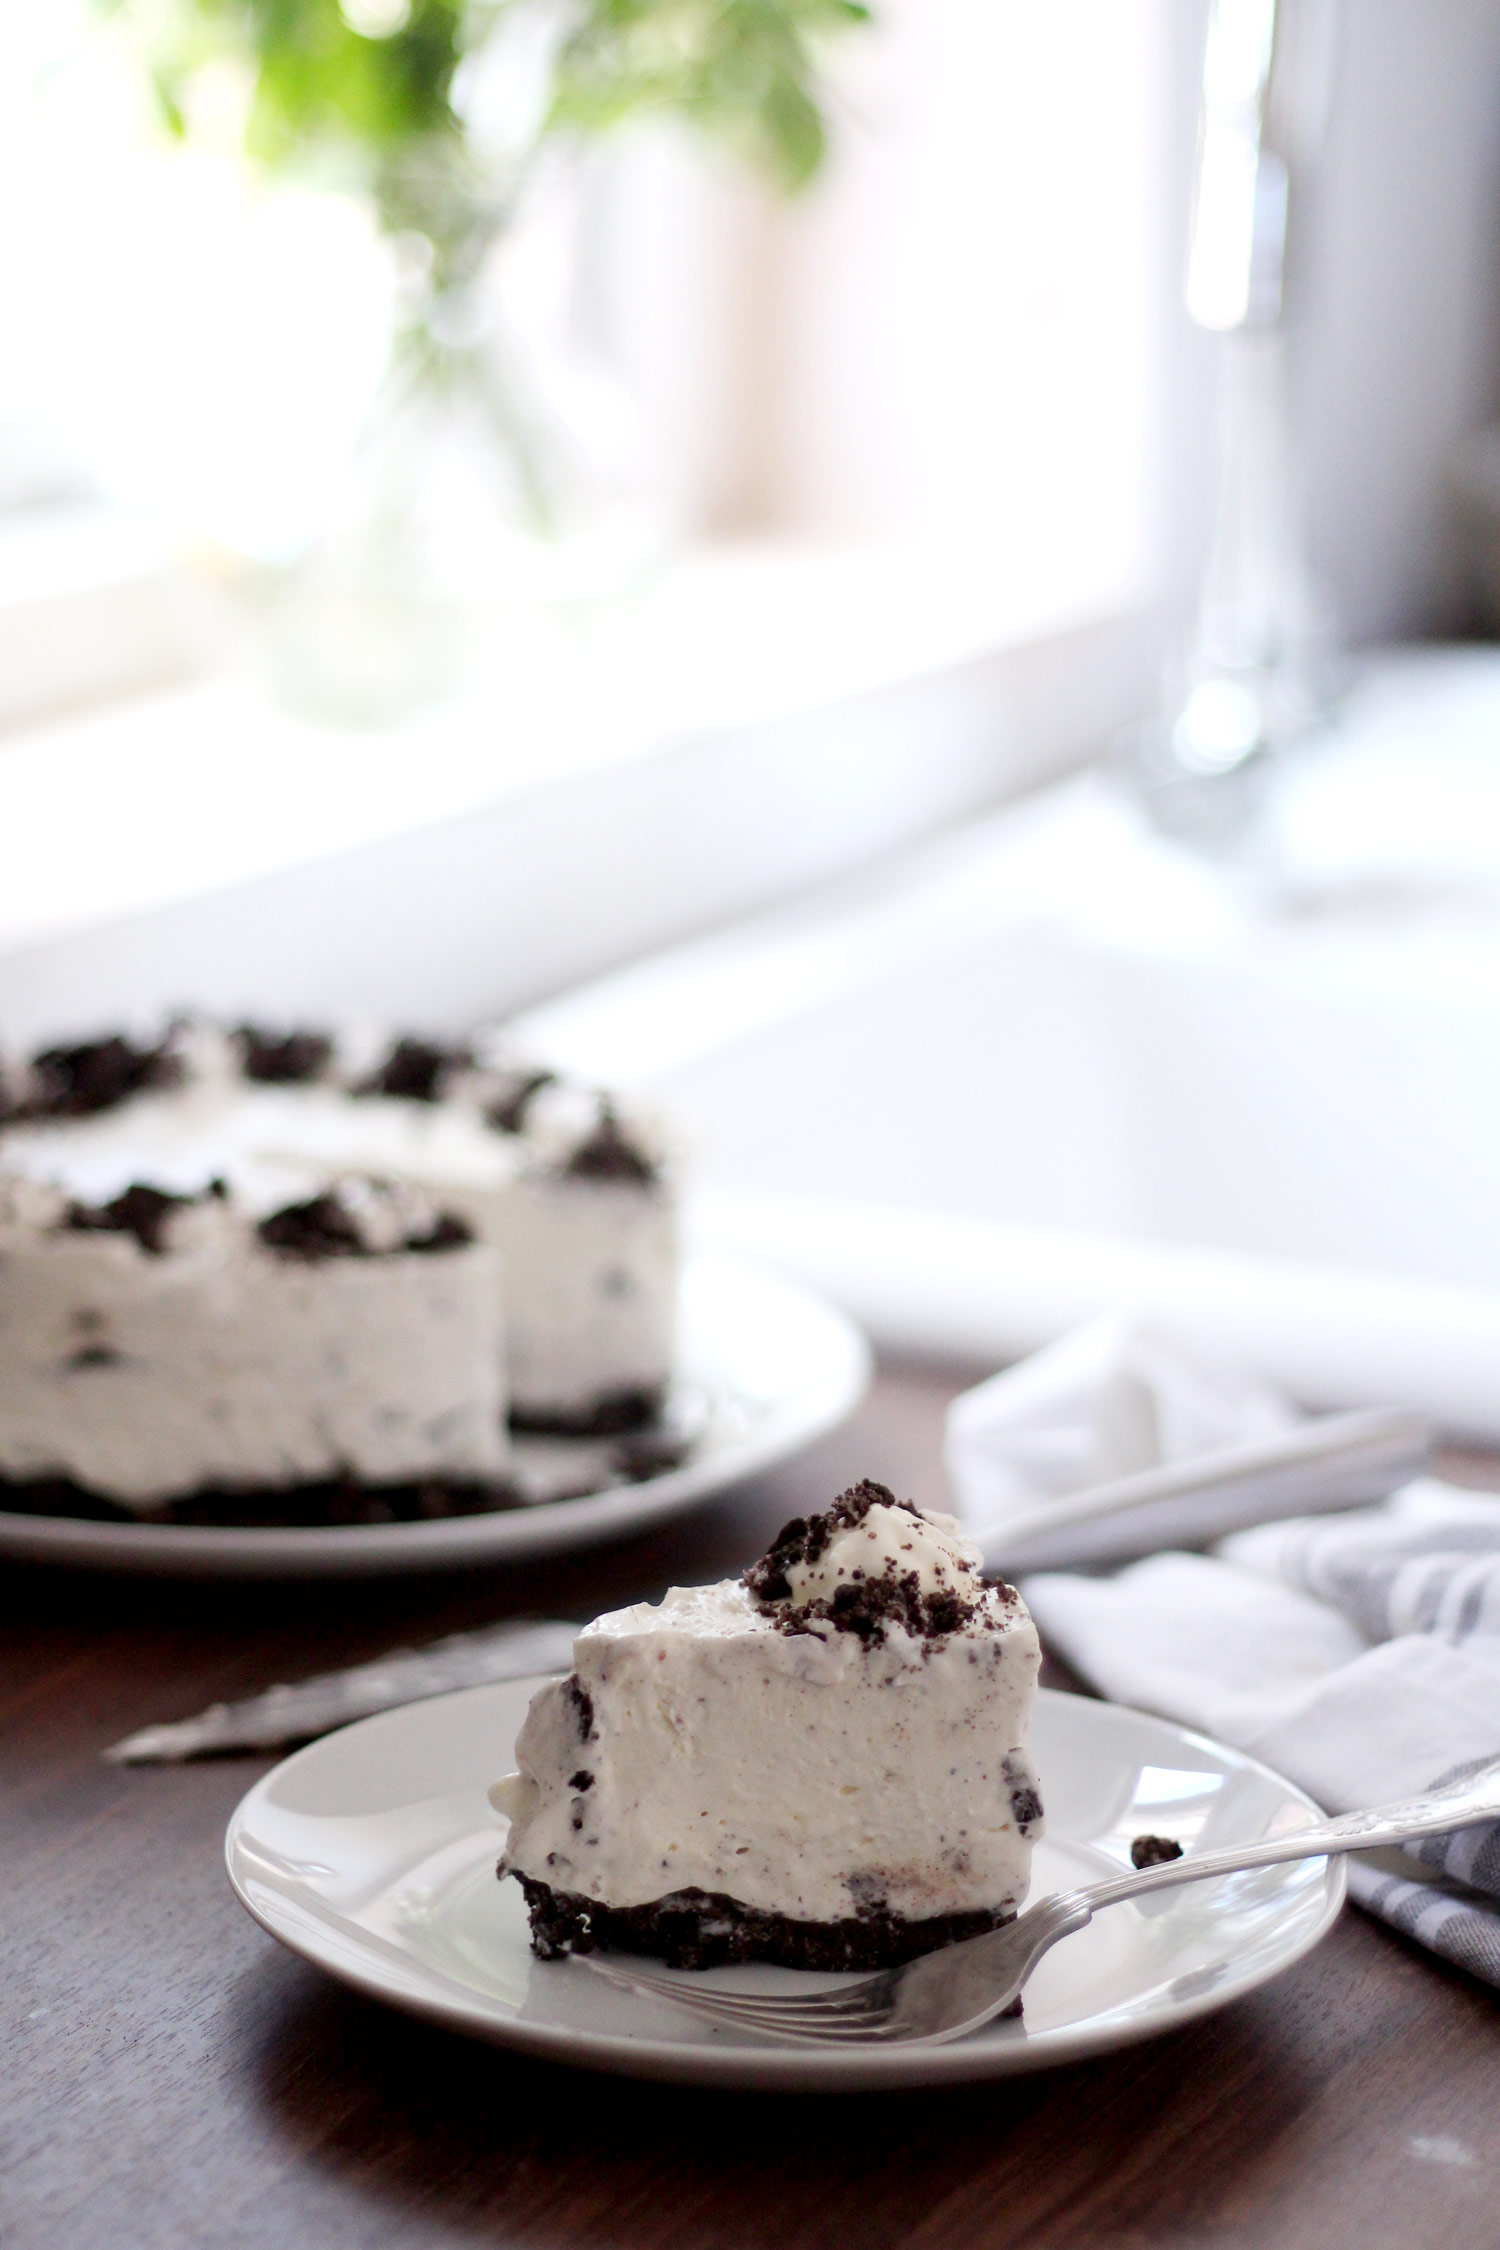 oreo-cheesecake-recipe-no-bake-easy-guide-8